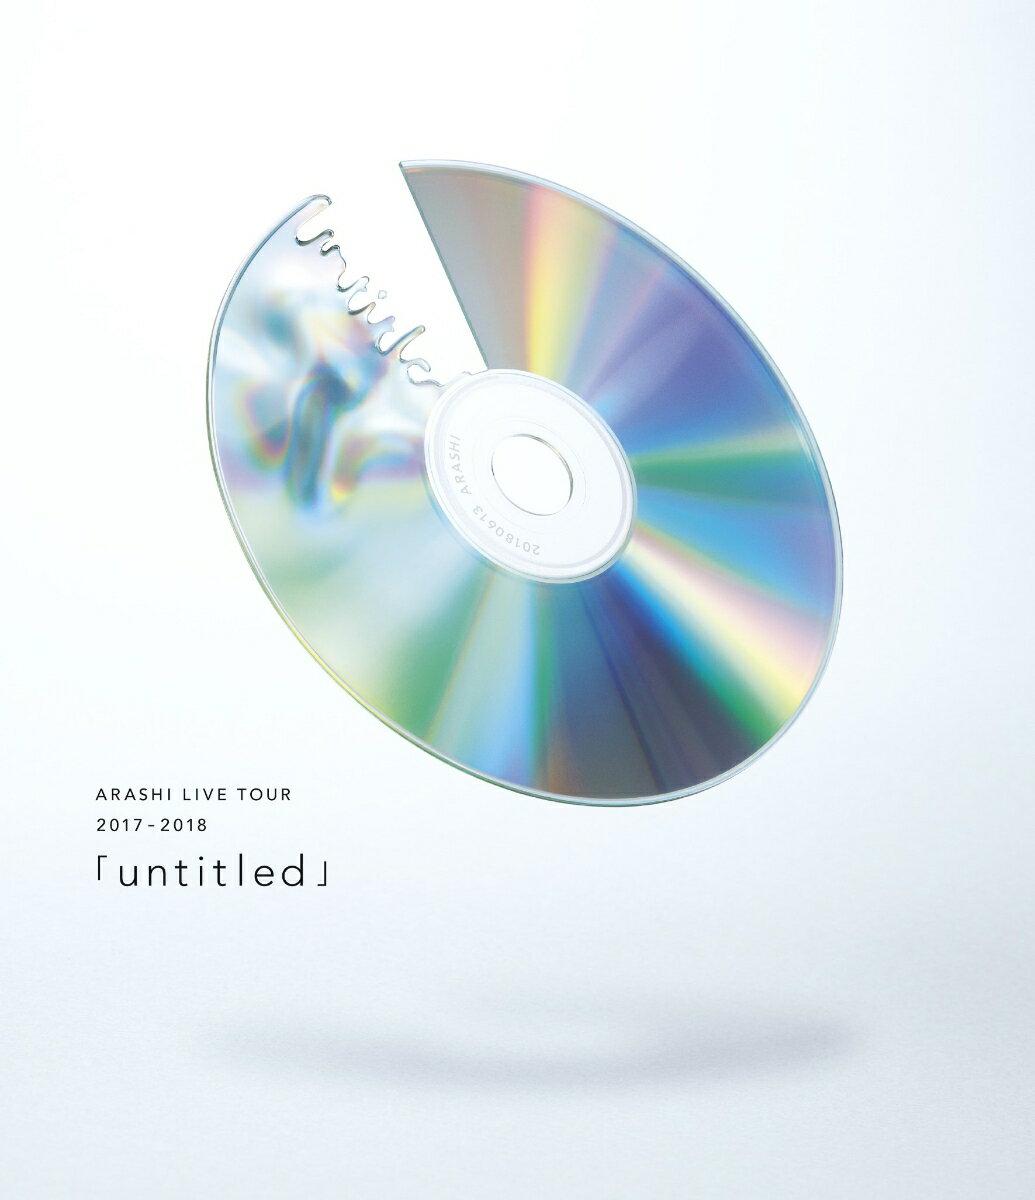 ARASHI LIVE TOUR 2017-2018 「untitled」(通常盤 Blu-ray)【Blu-ray】 [ 嵐 ]